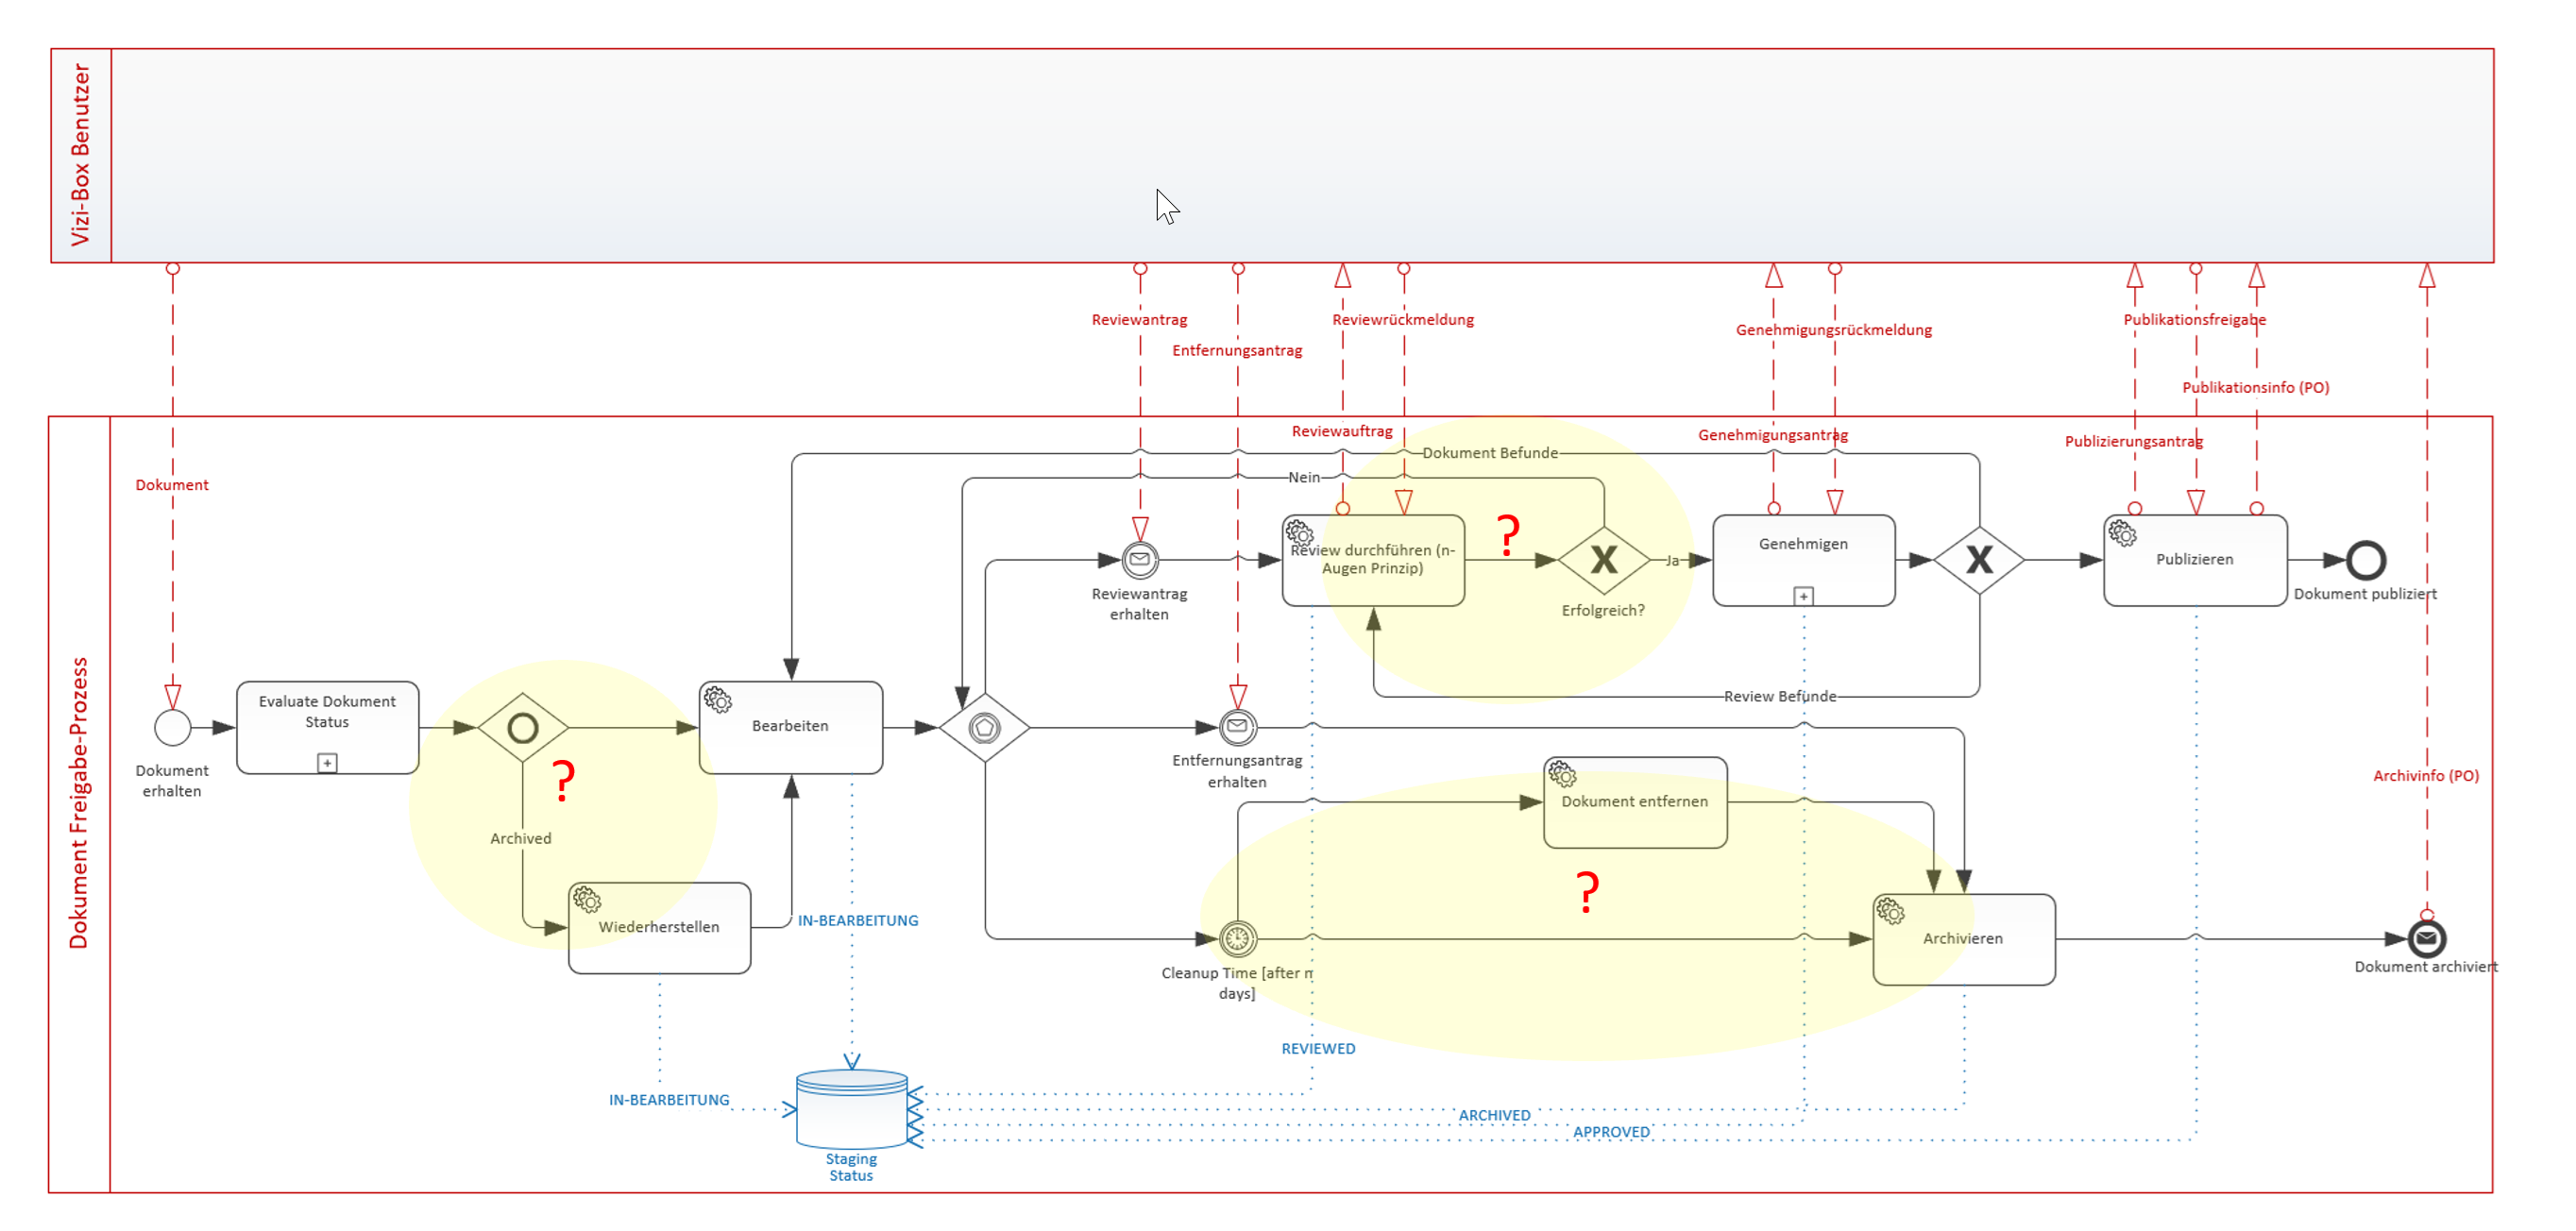 BPMN Diagramm